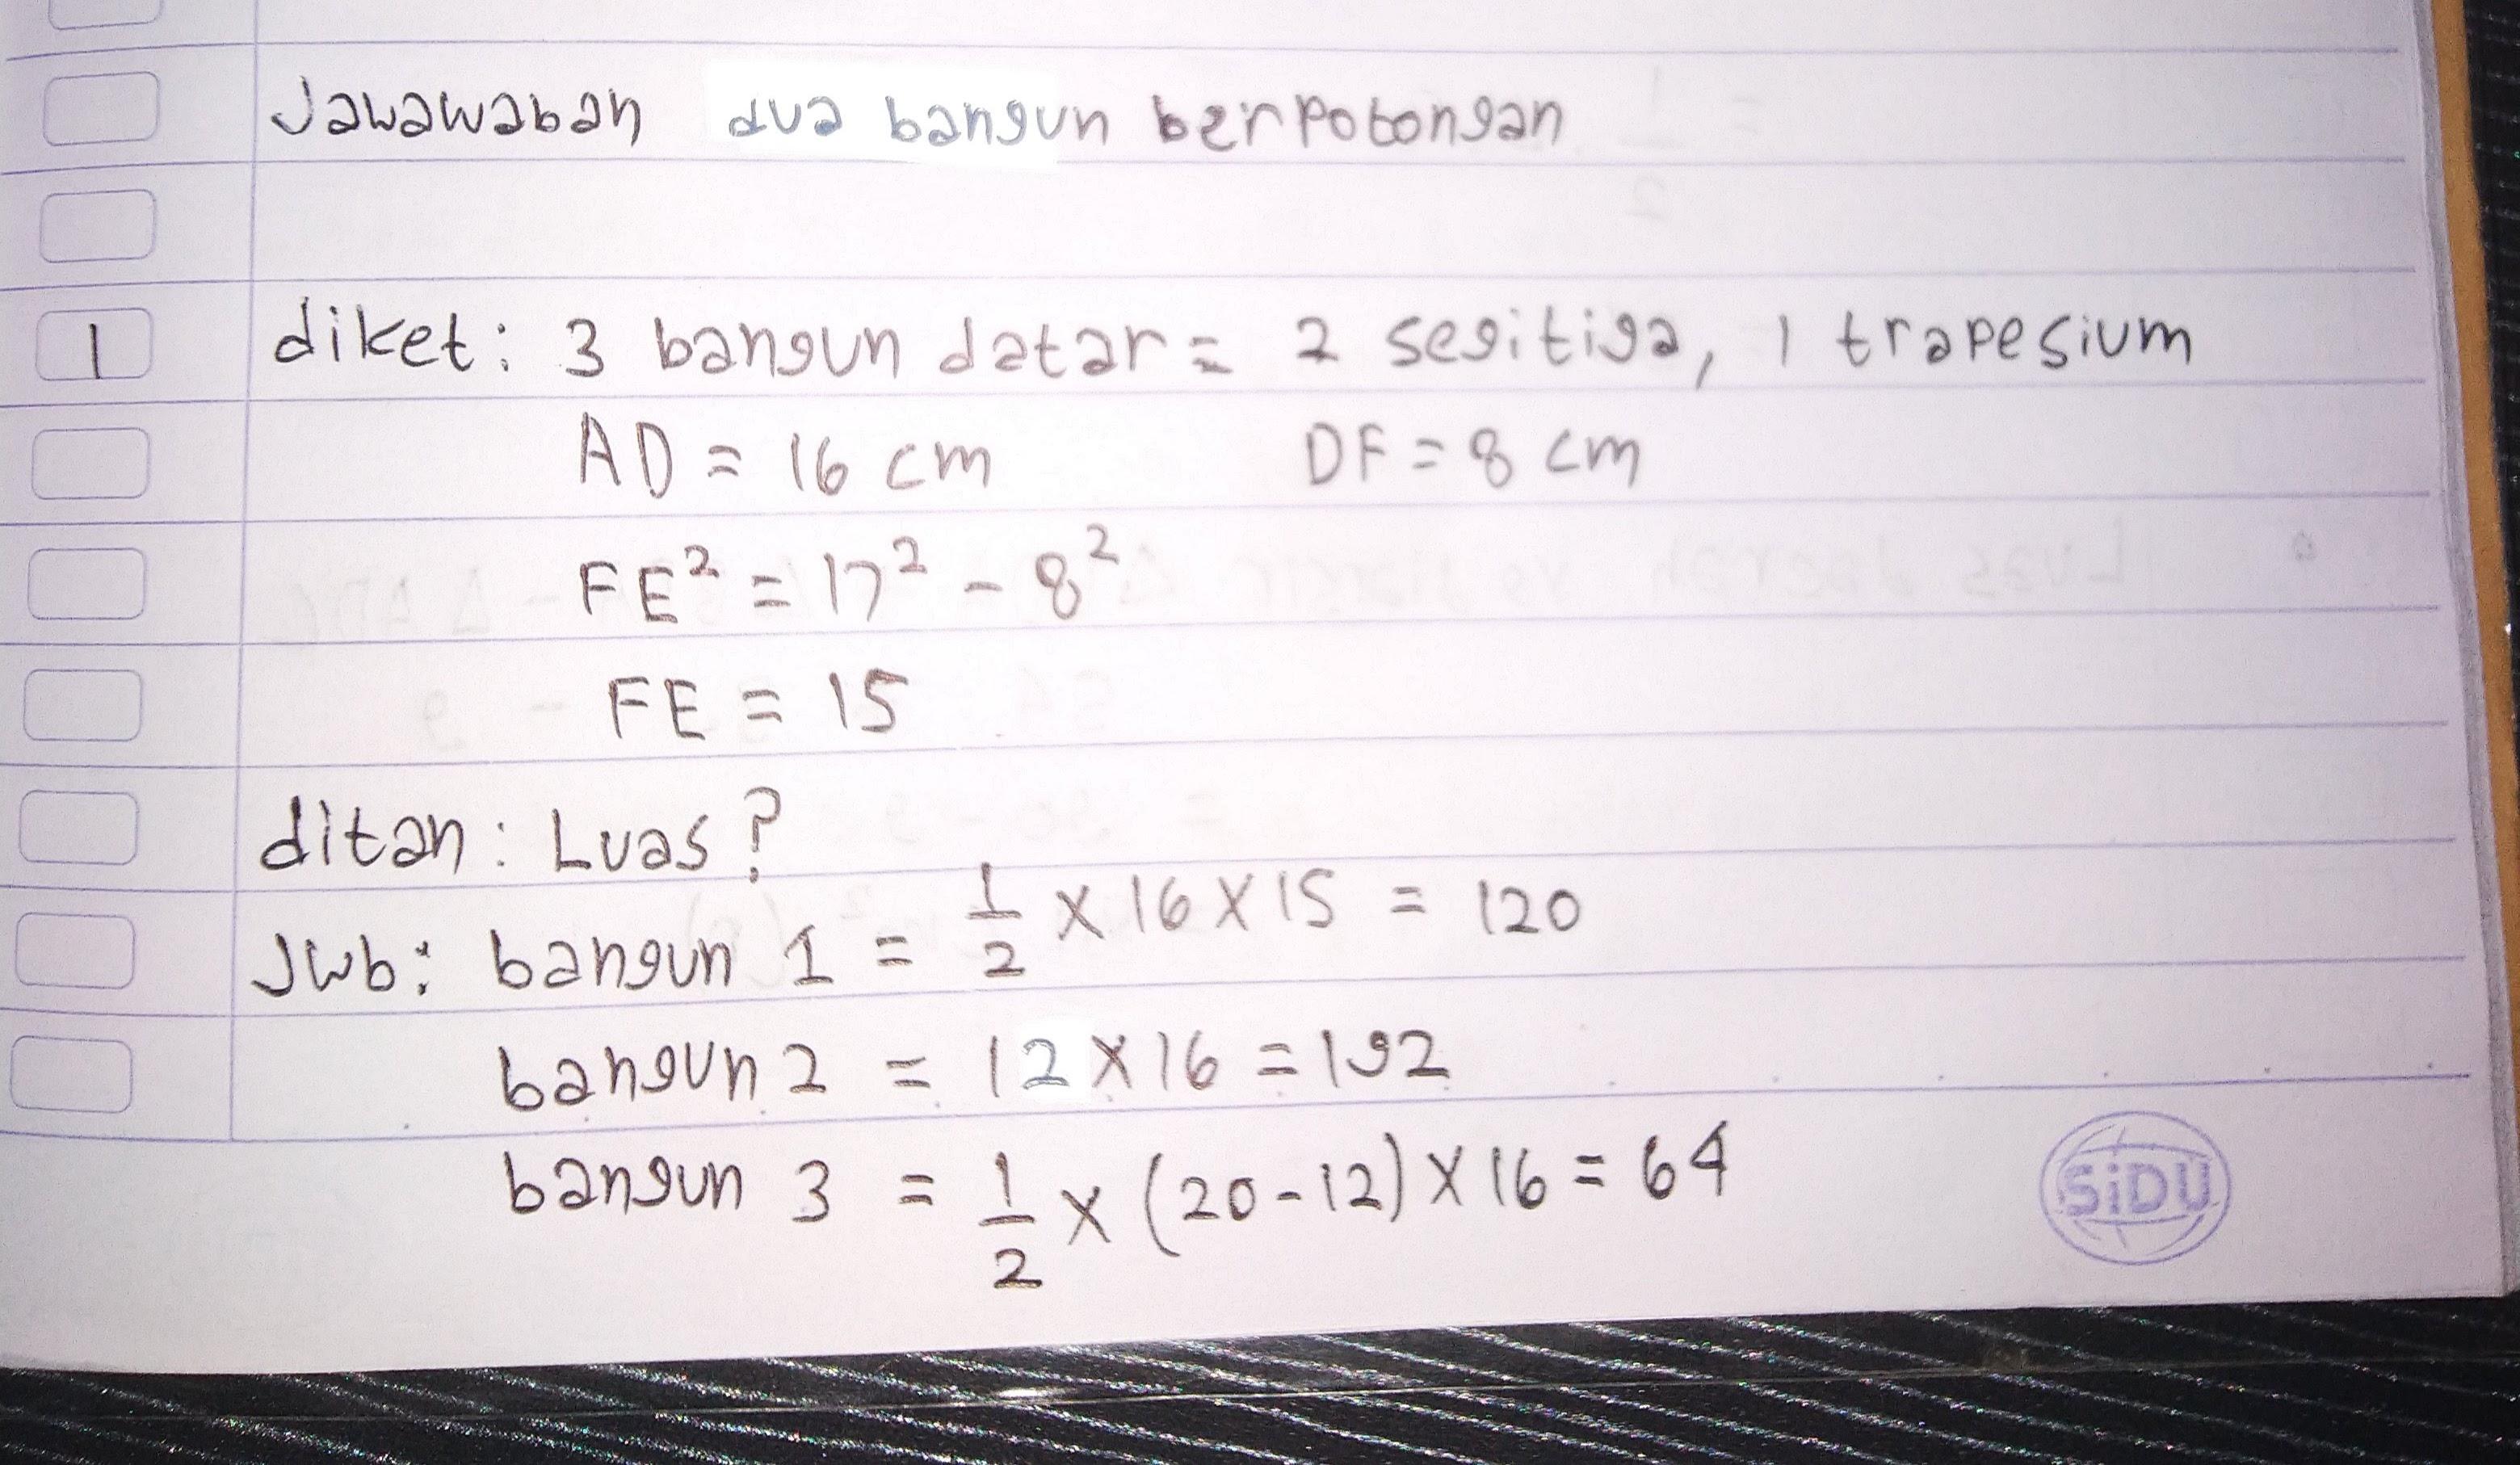 Soal Ujian Matematika beserta jawabannya